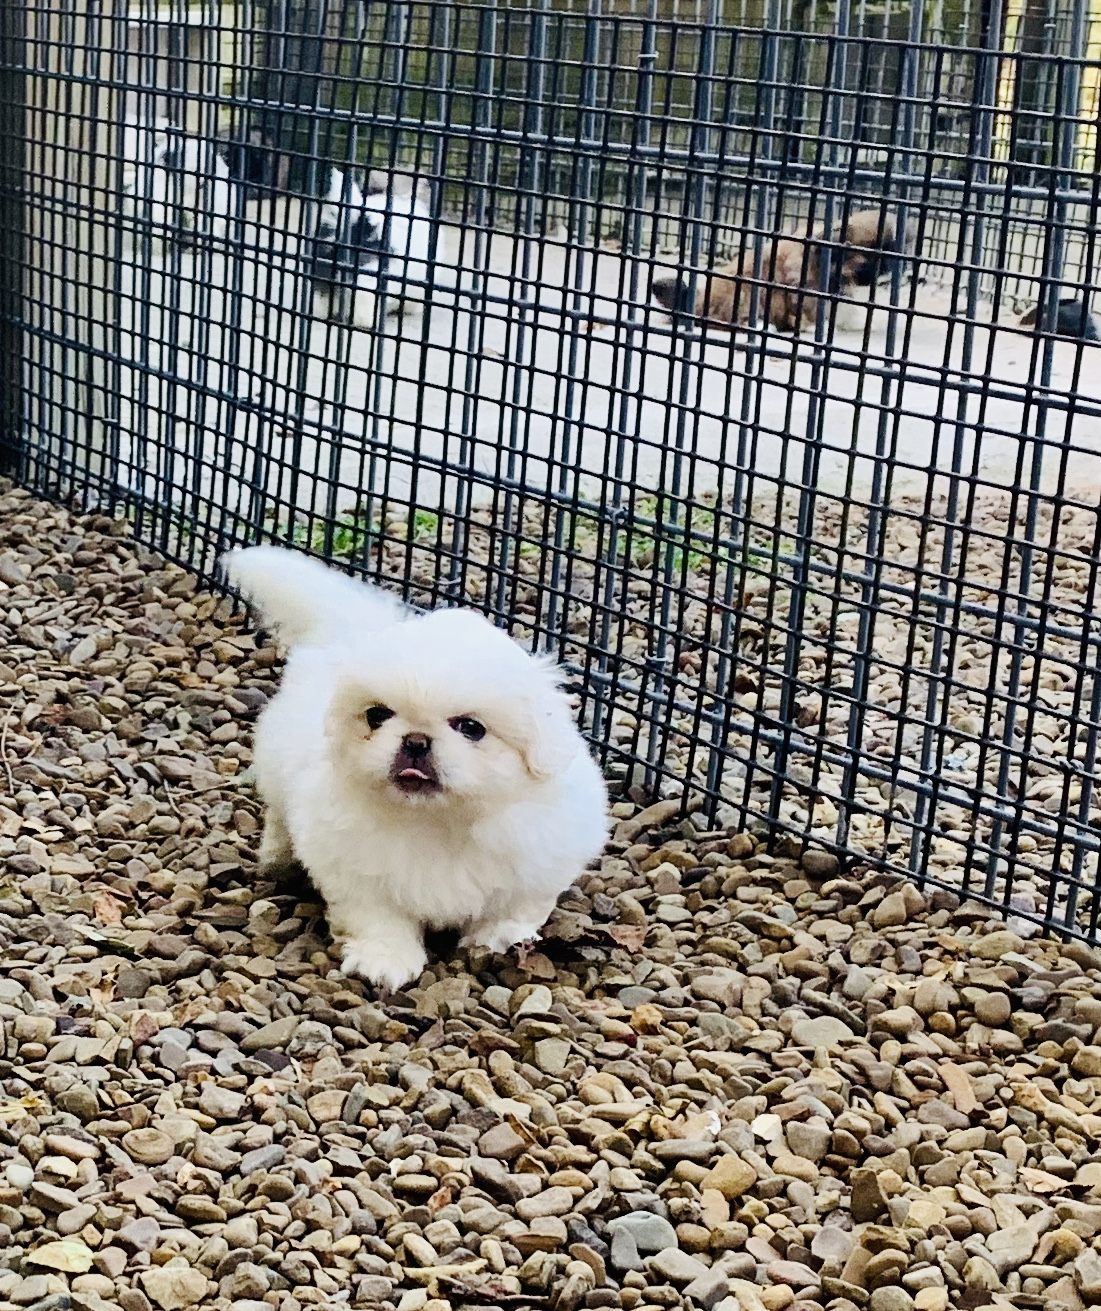 A Pekingese puppy